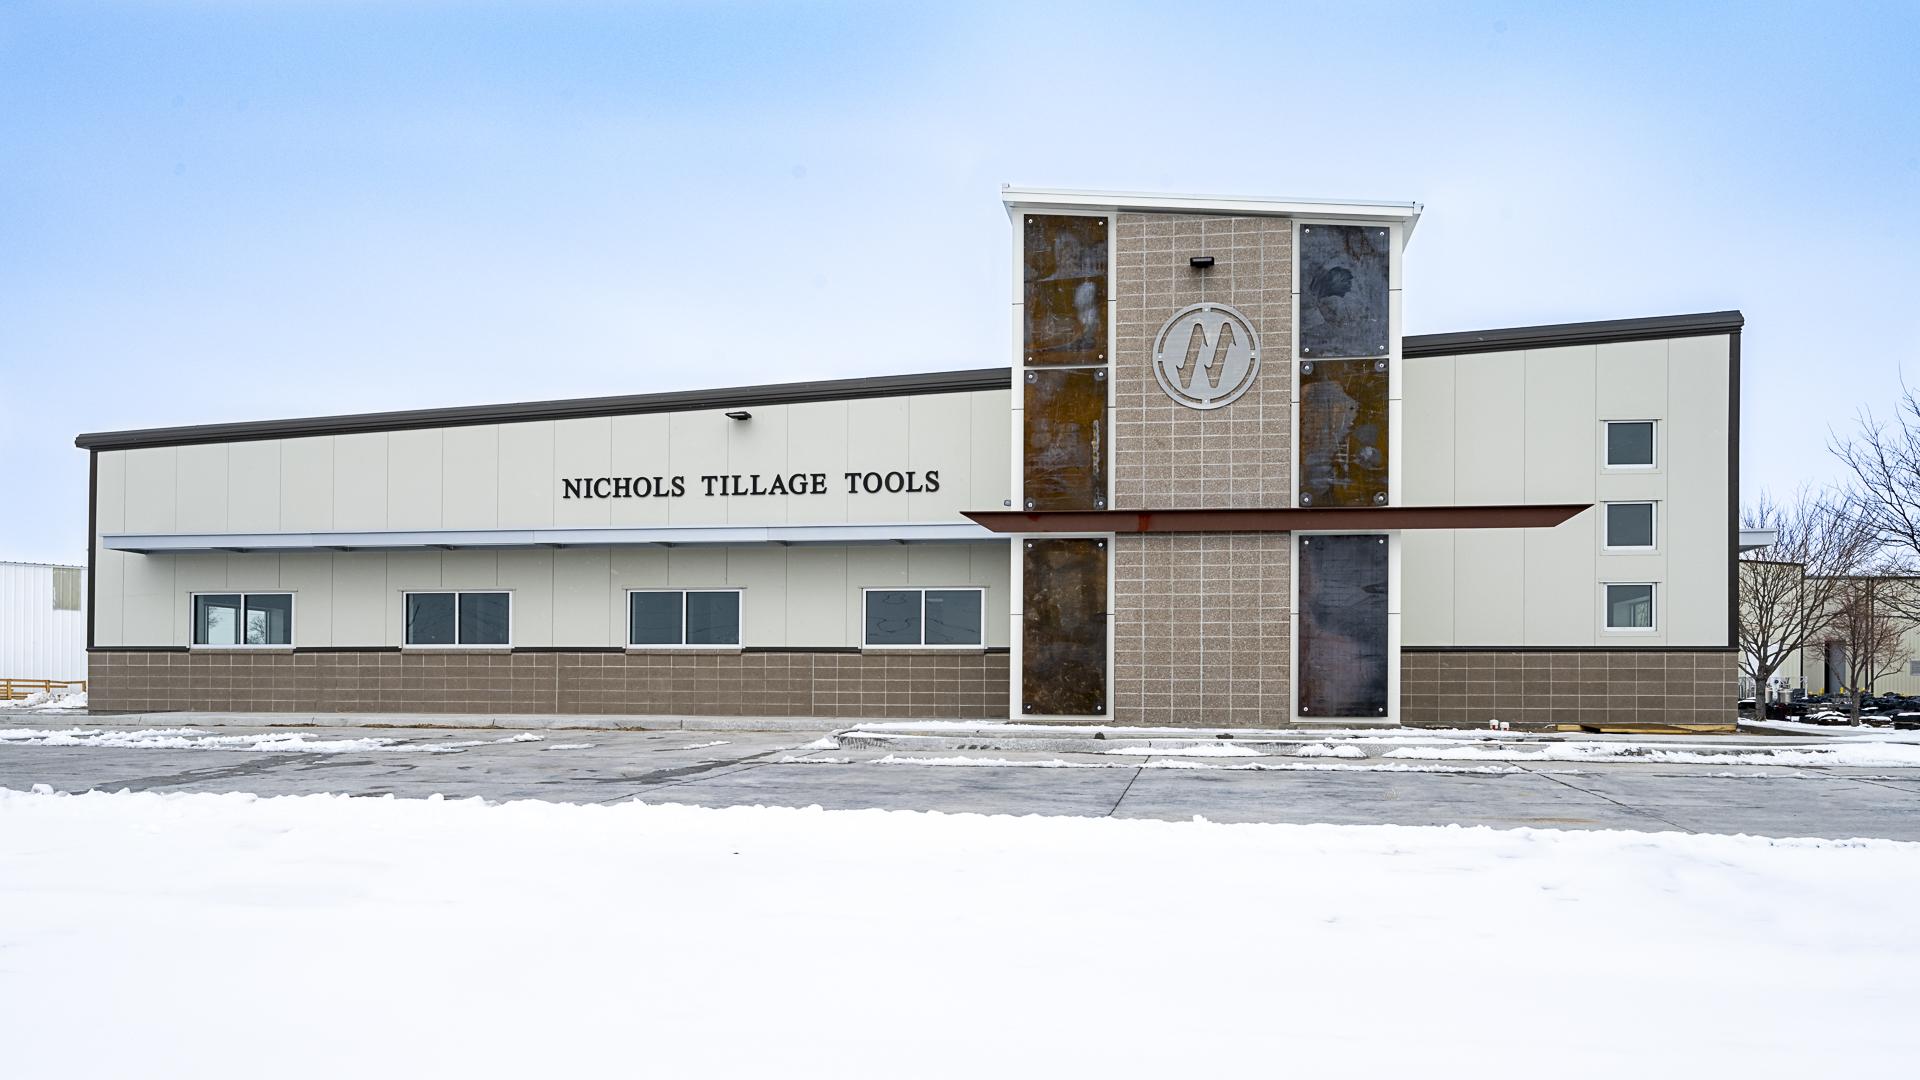 Nichols Tillage Tools